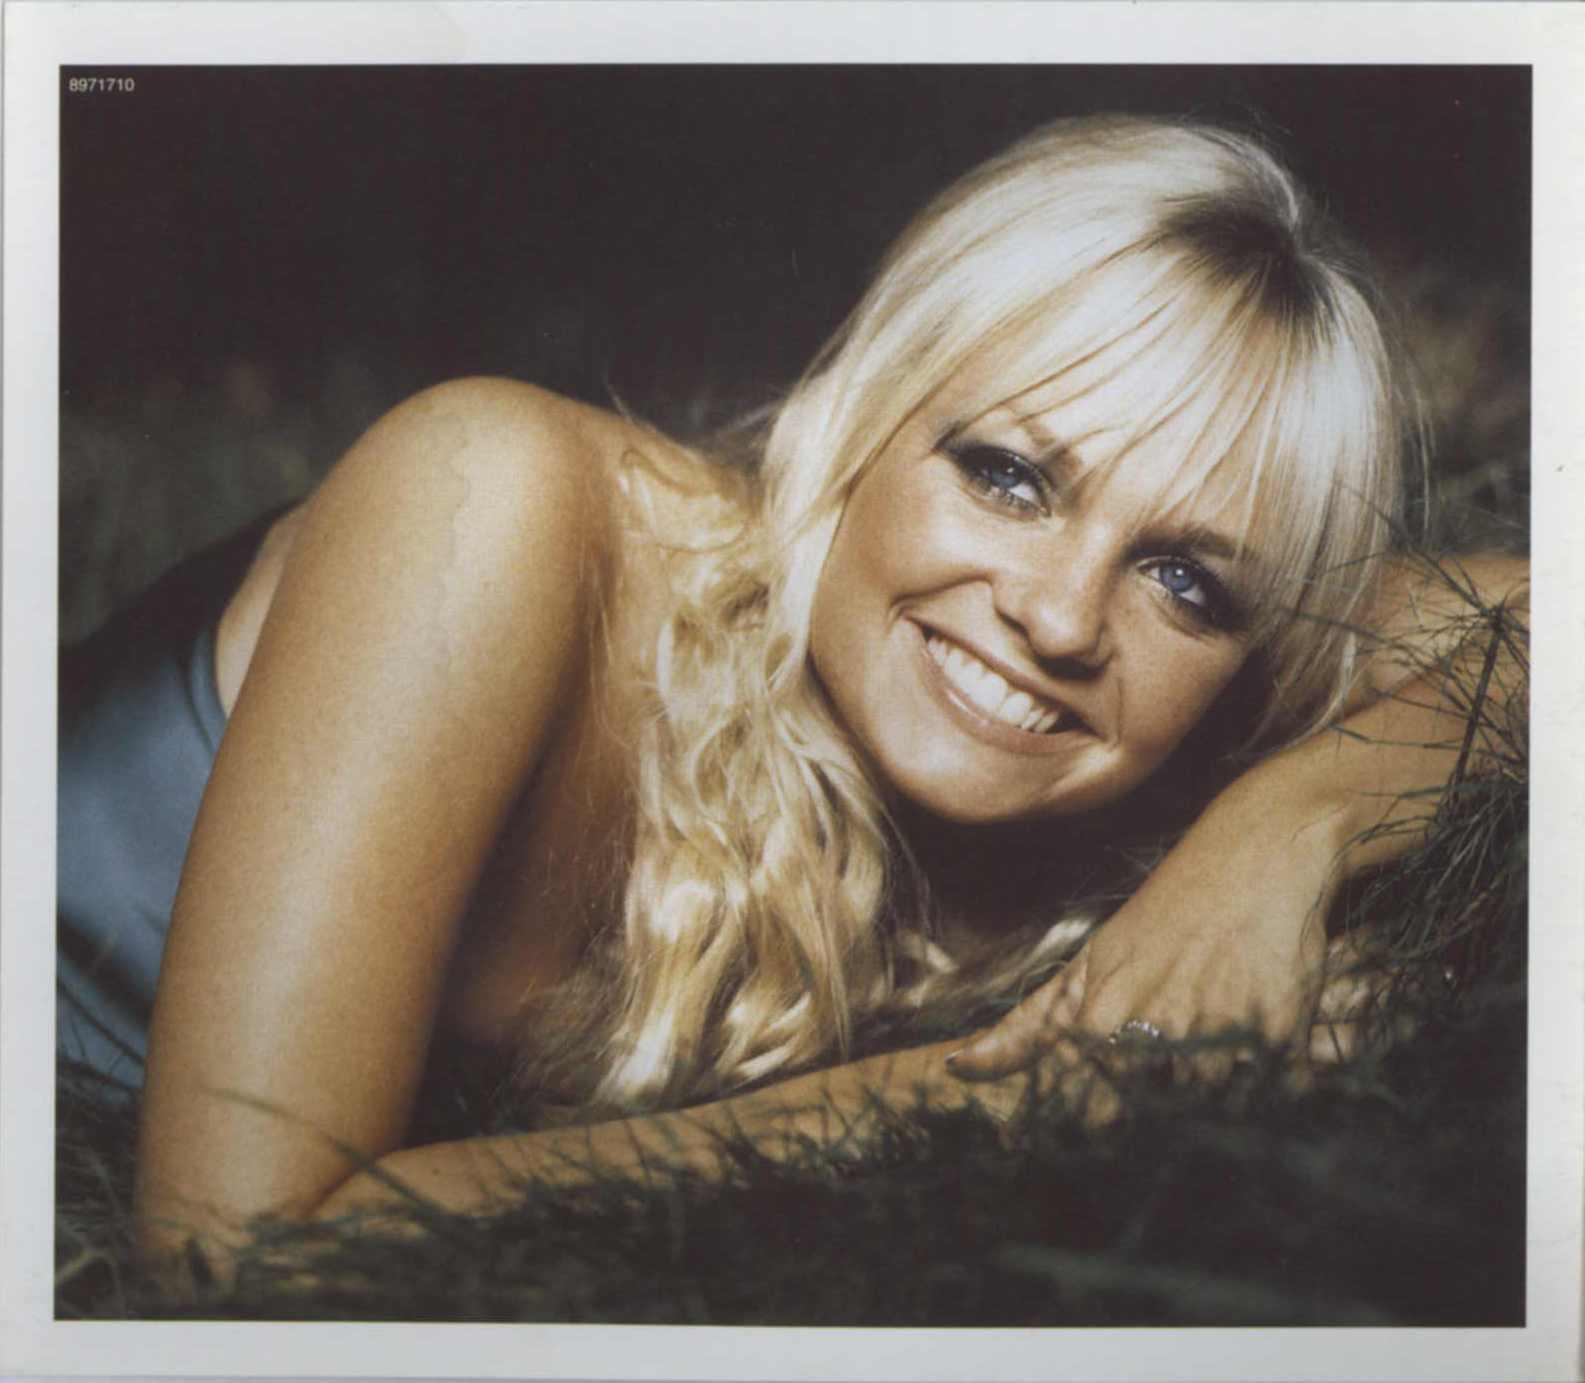 SPICE GIRLS - LET LOVE LEAD THE WAY 2000 UK ENHANCED CD2 W/POSTCARDS DIGIPAK